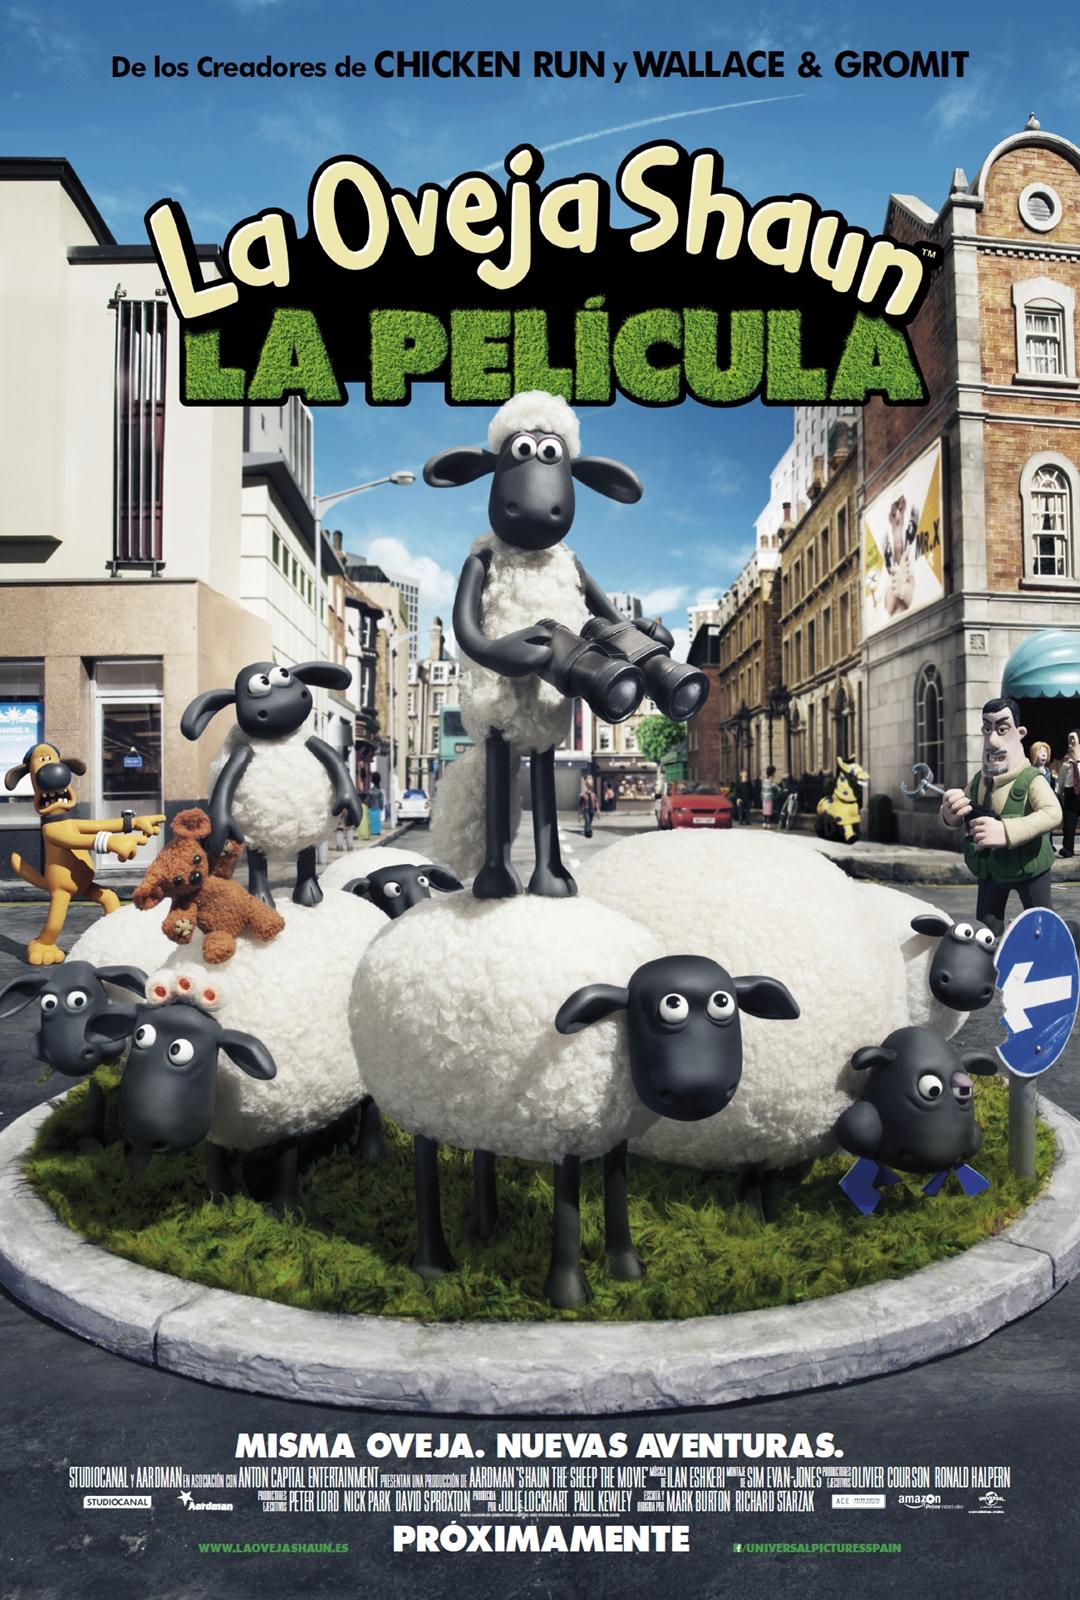 la oveja shaun cartel